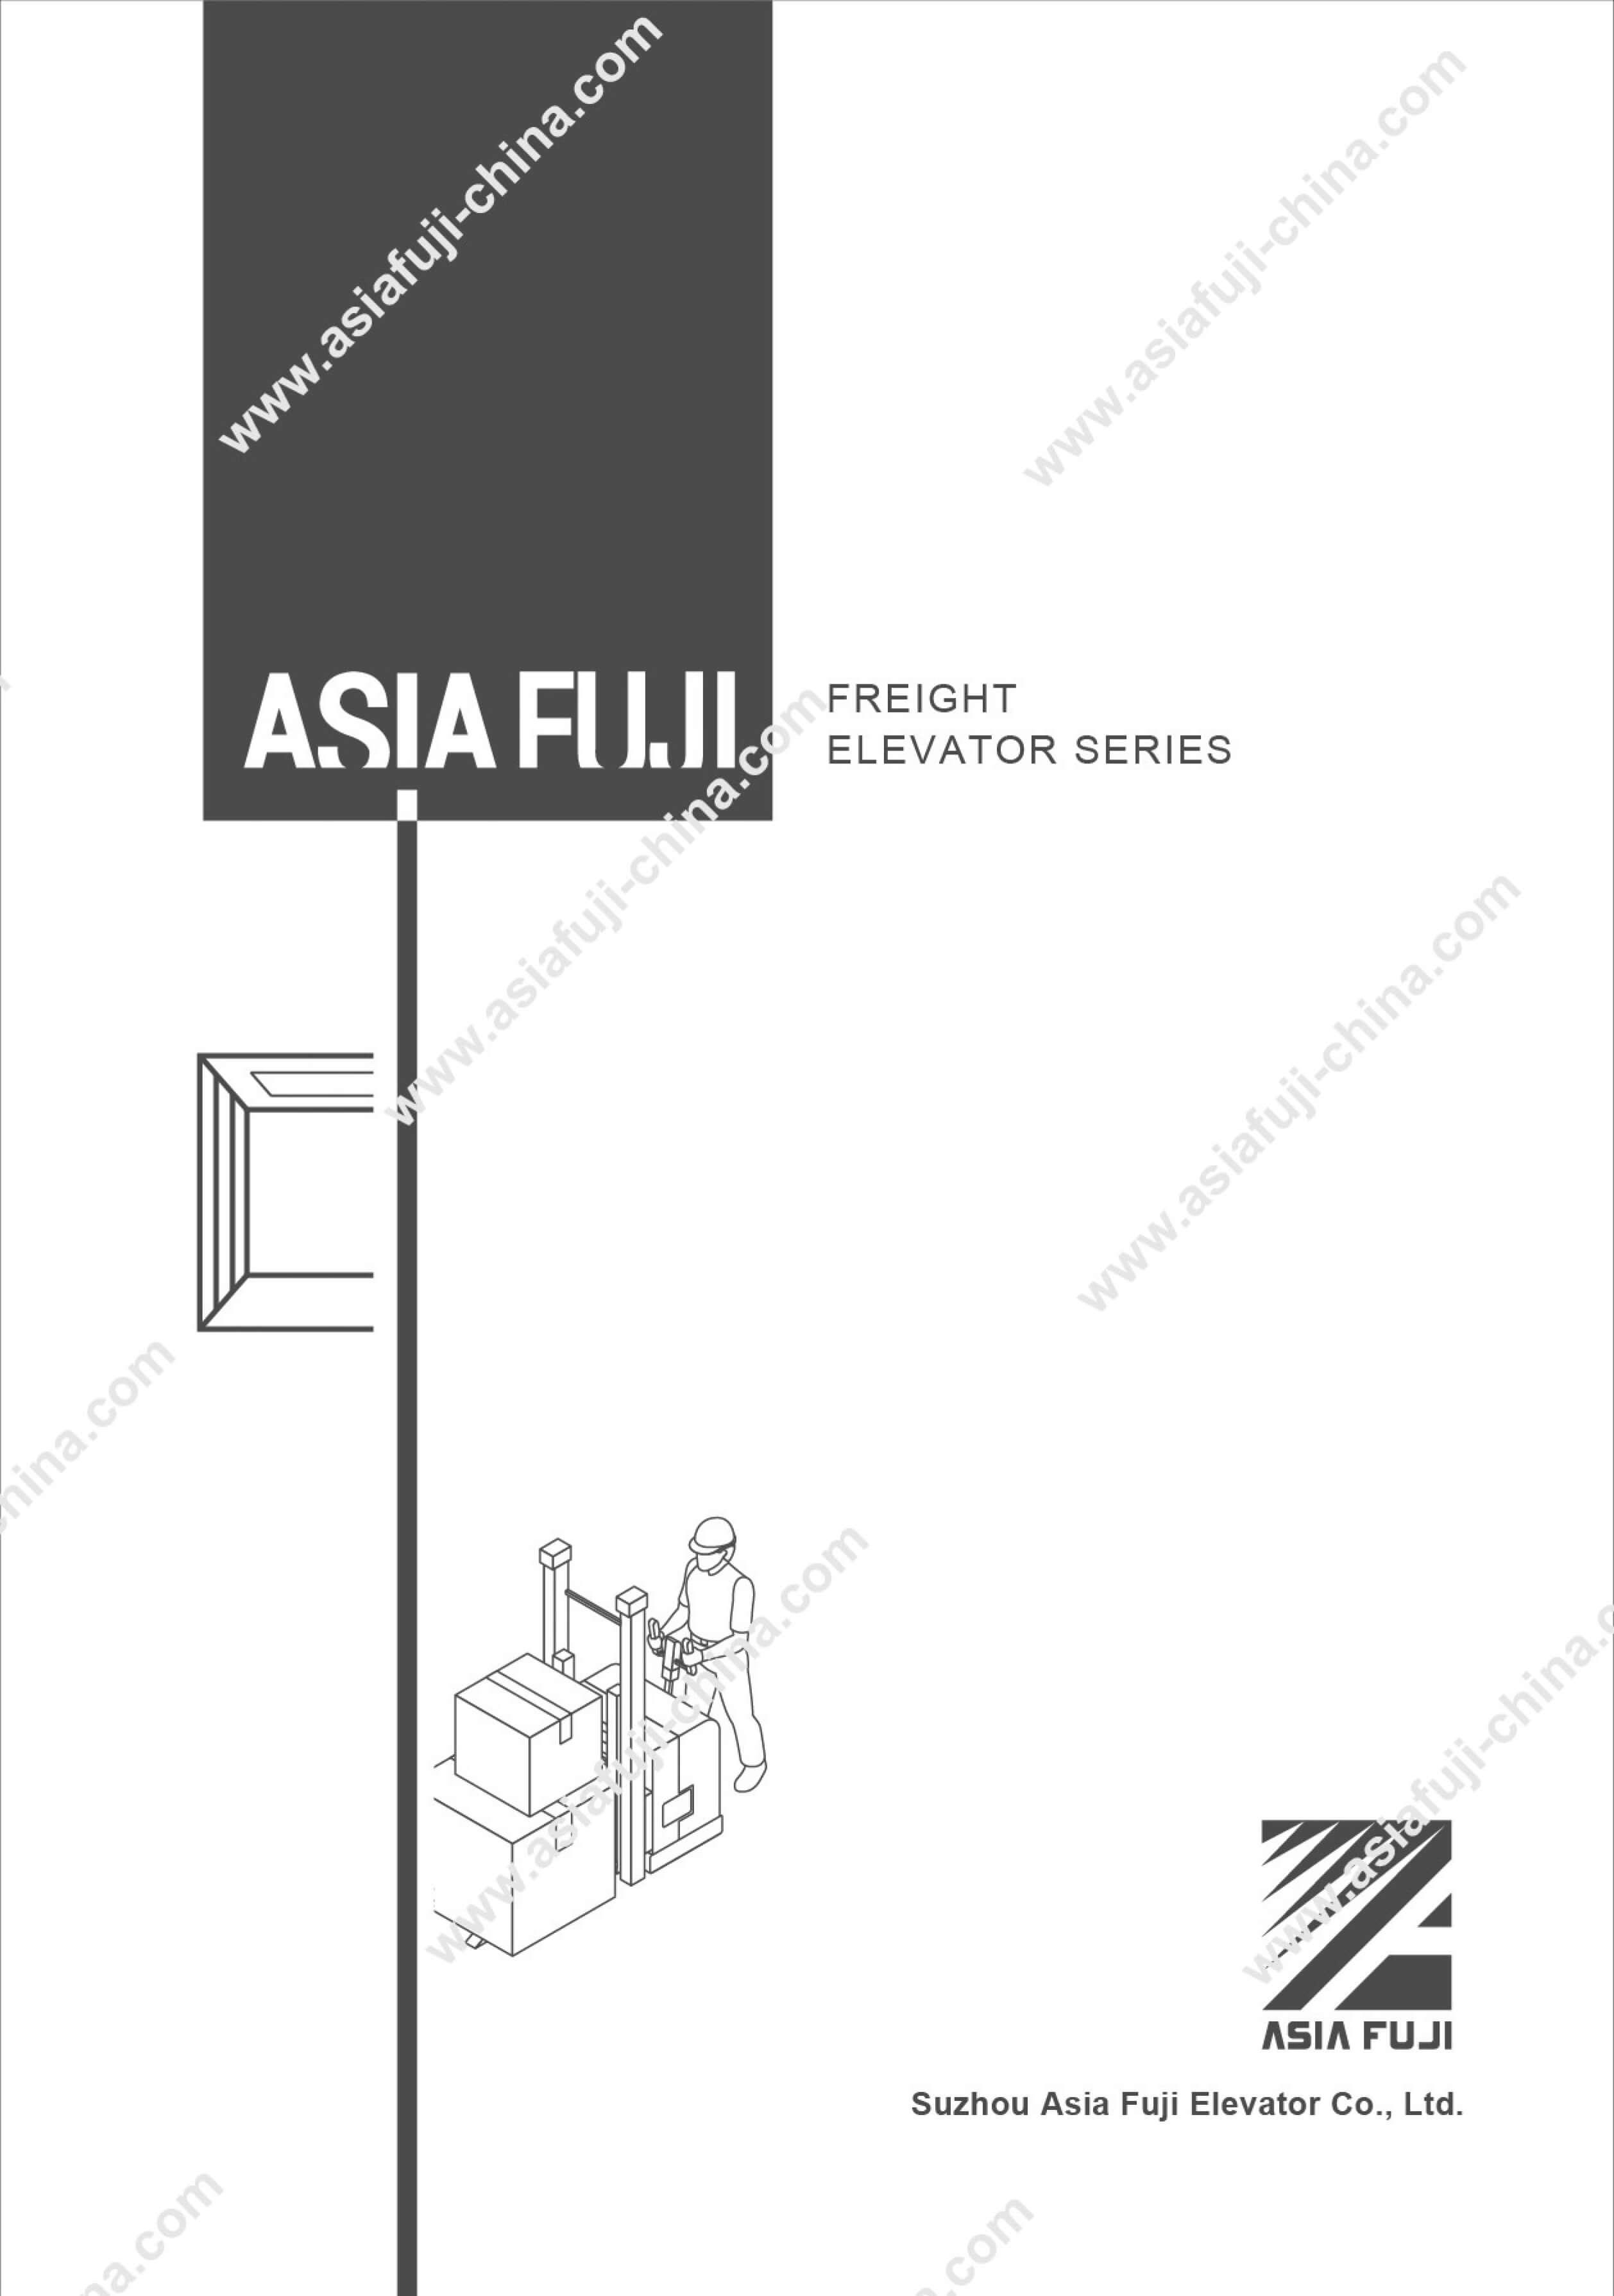 FUJI-Freight-Lift-1b